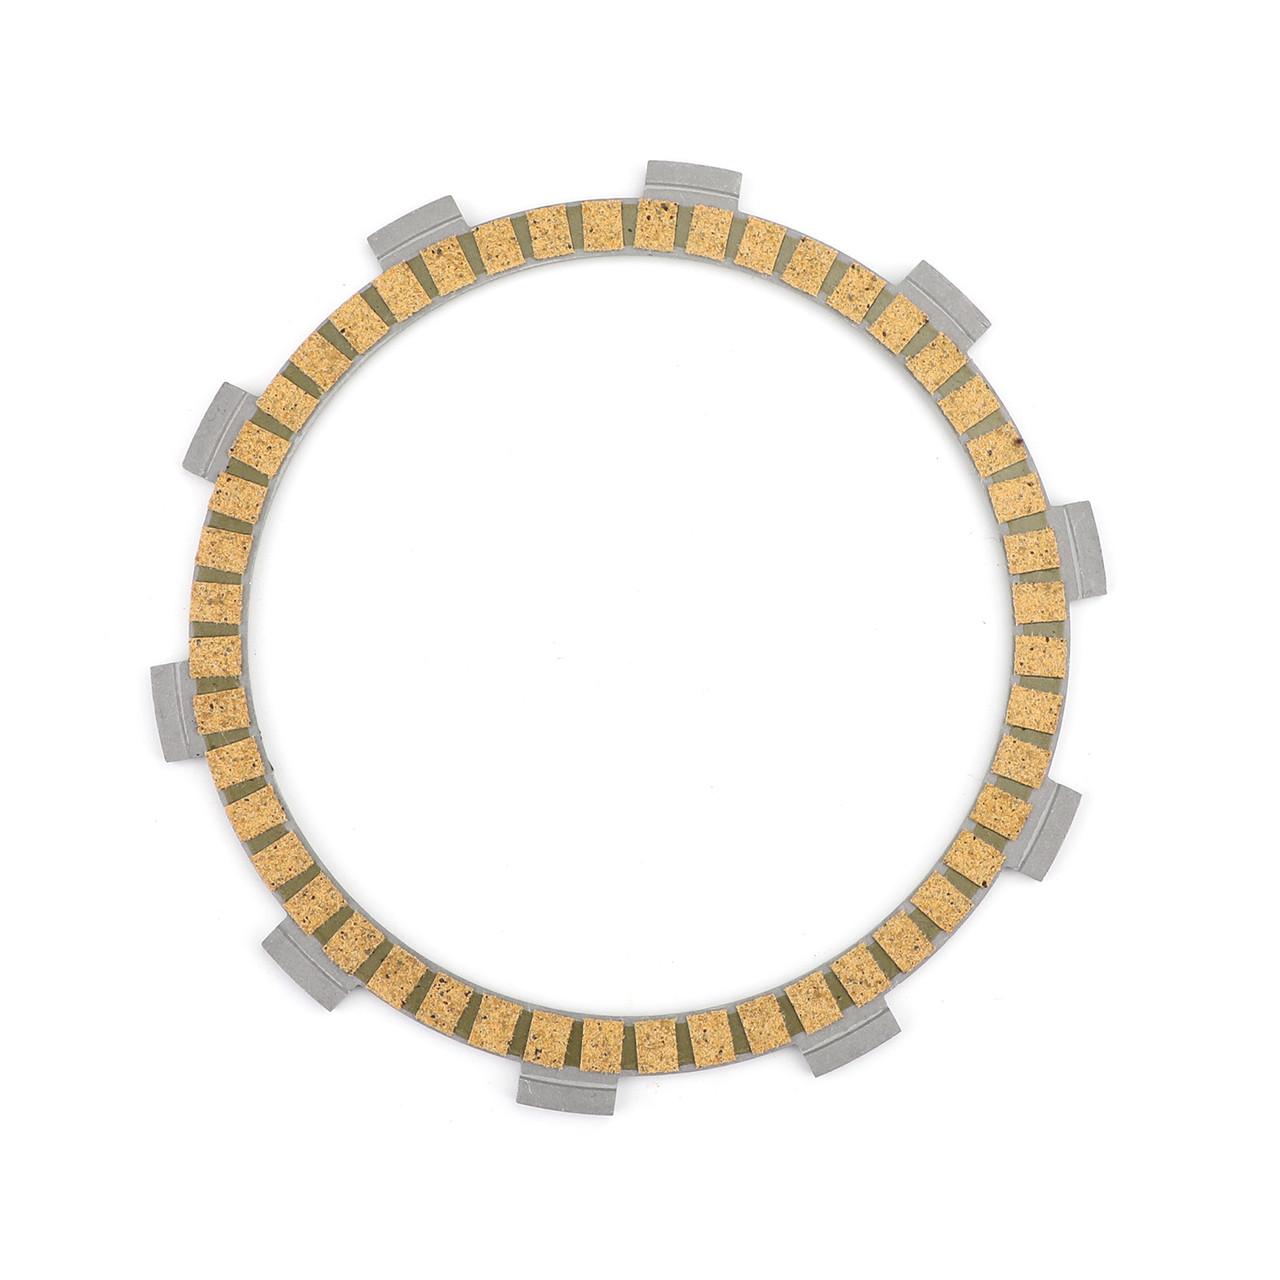 Clutch Plate Kit Fit For Honda CRM125R 90-99 NSR125F 88-93 NSR125R 89-92 ATV TRX350TE TRX350FE FourTrax 350 ES 00-06